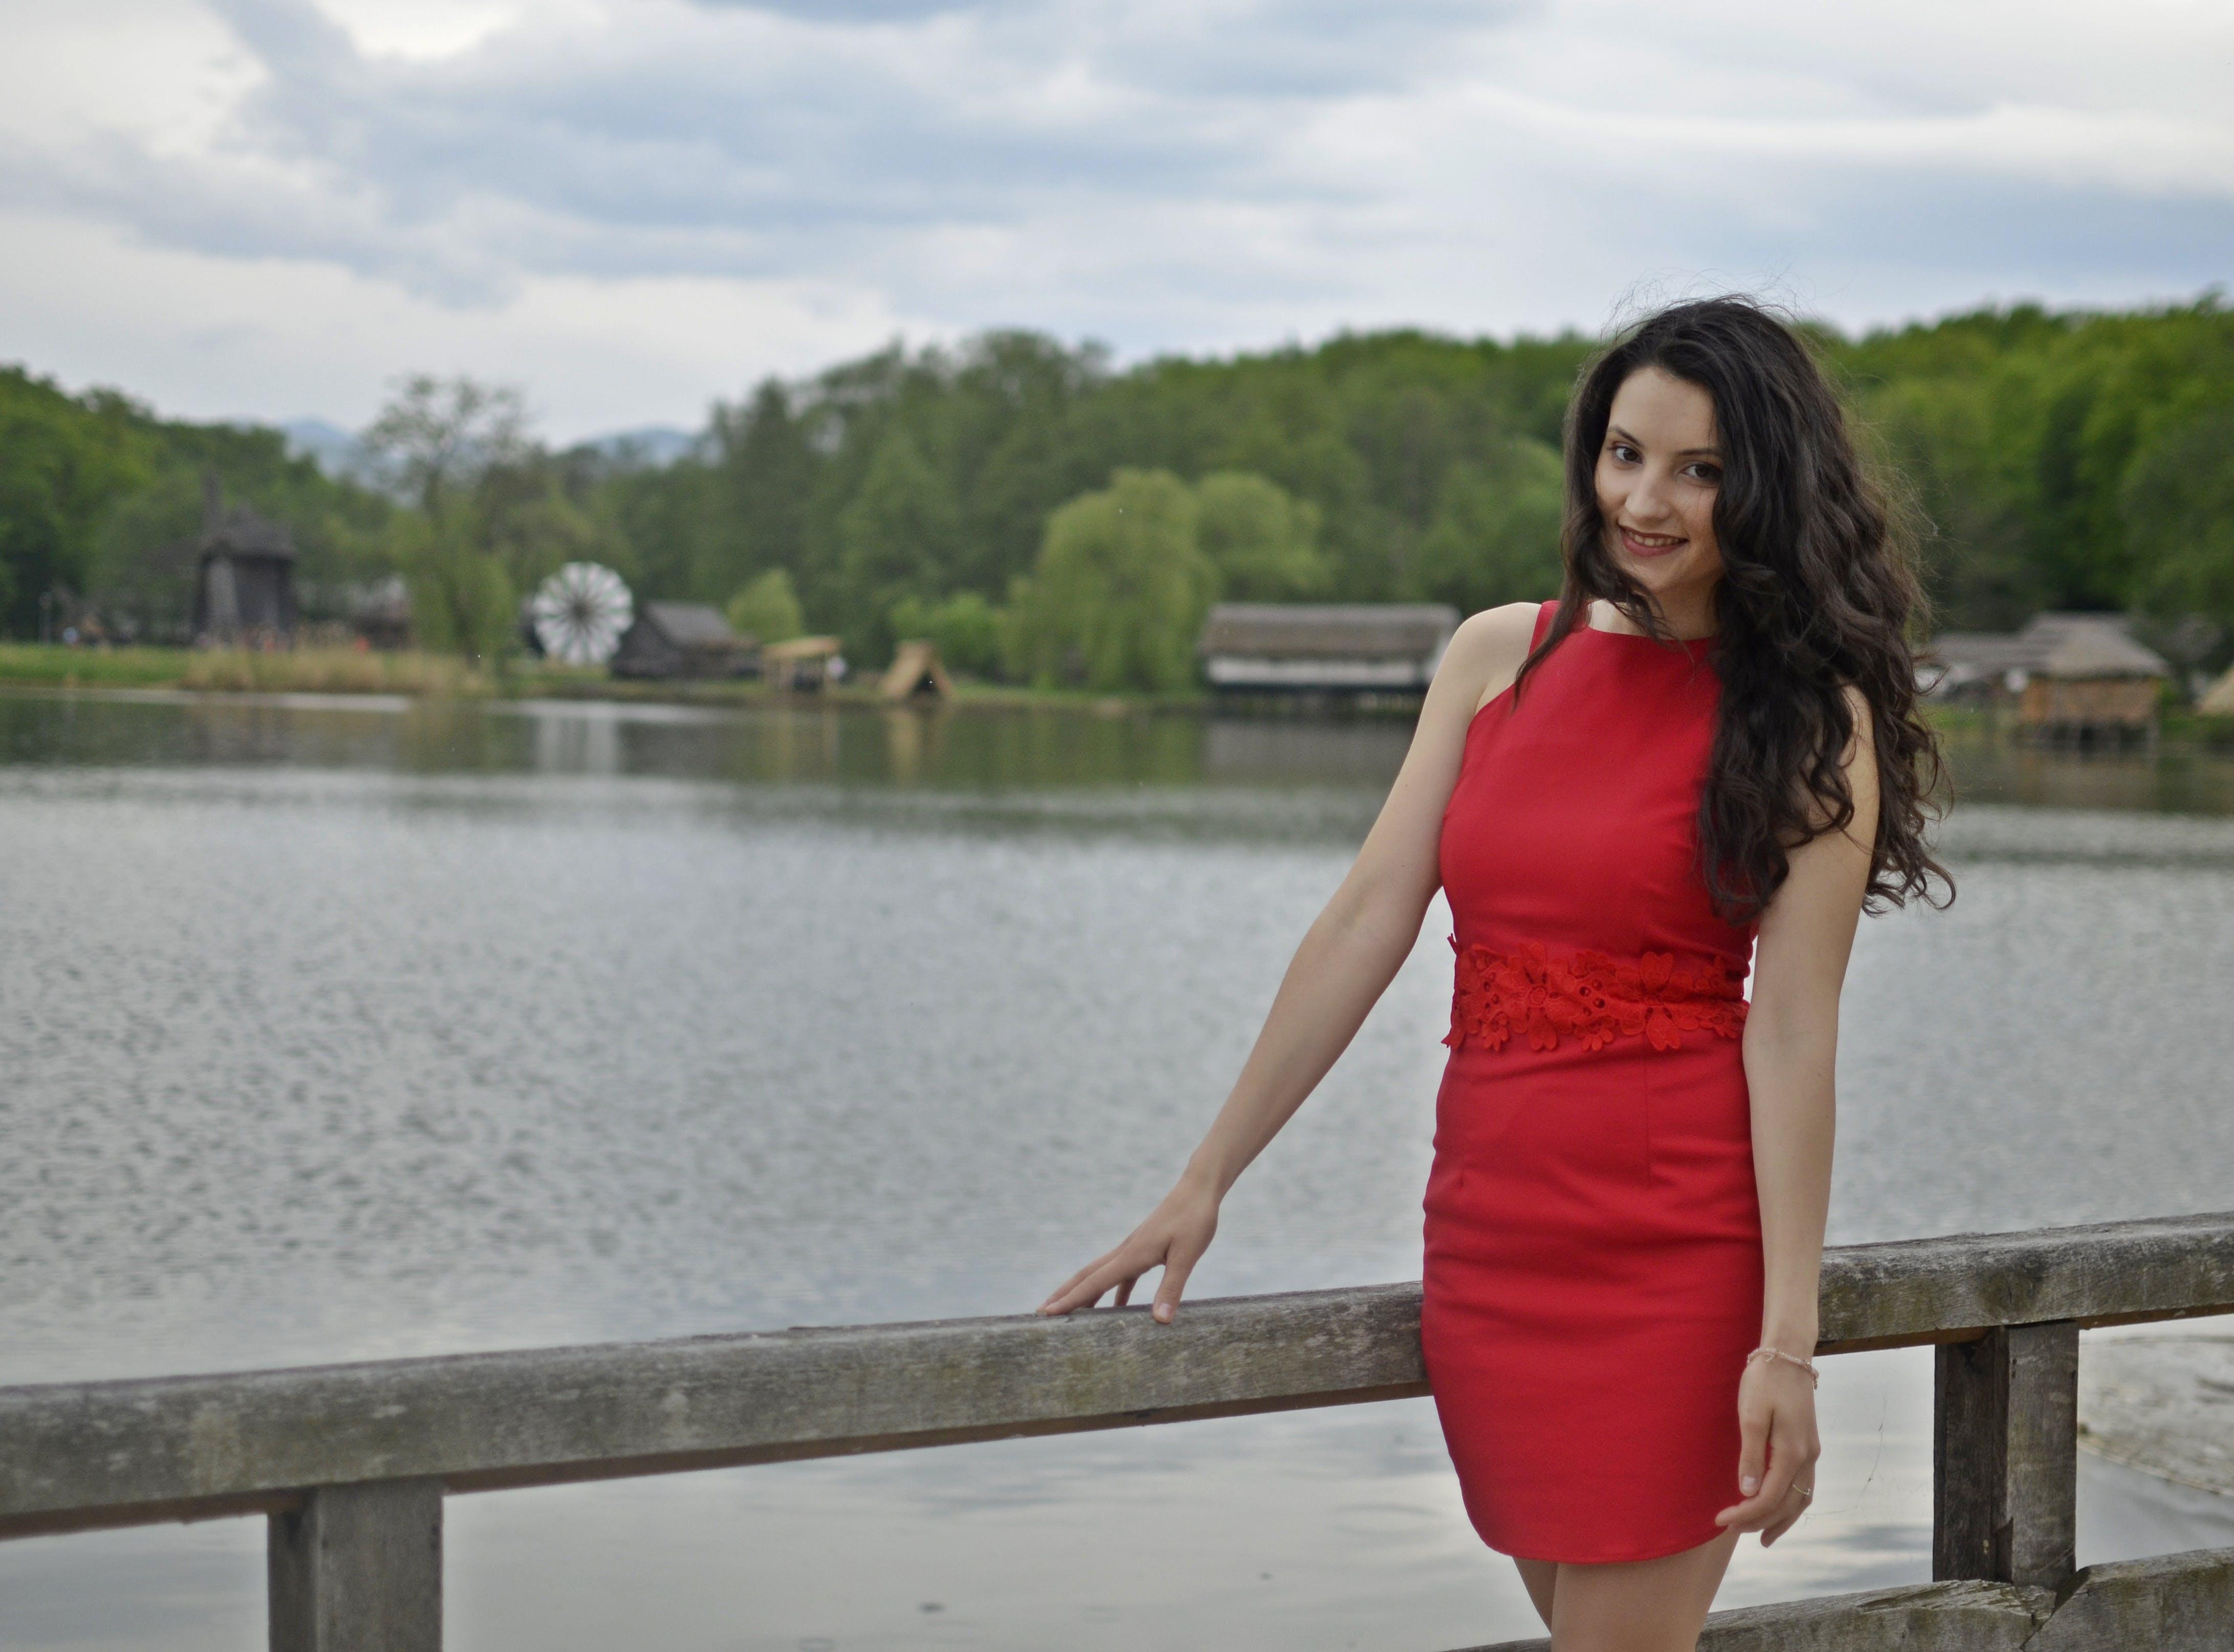 Woman Leaning on Bridge Bar Near Body of Water